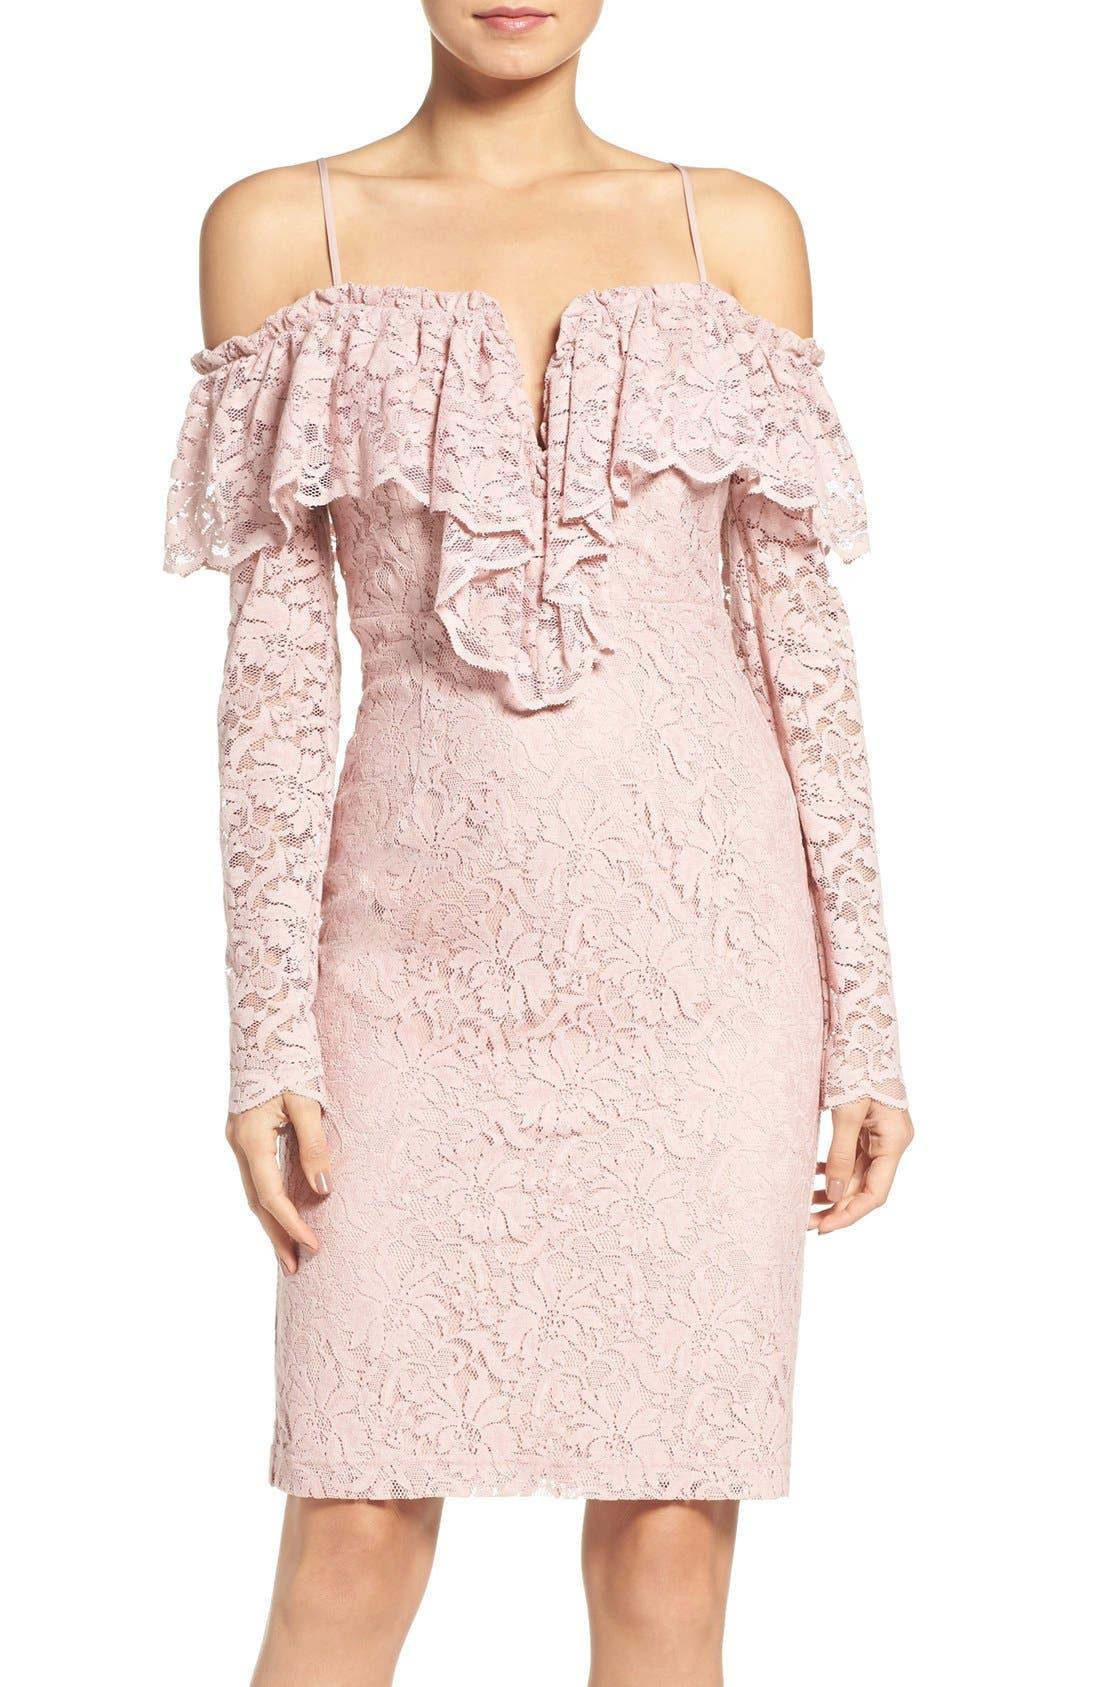 Alternate Image 1 Selected - Bardot Allessandra Lace Sheath Dress